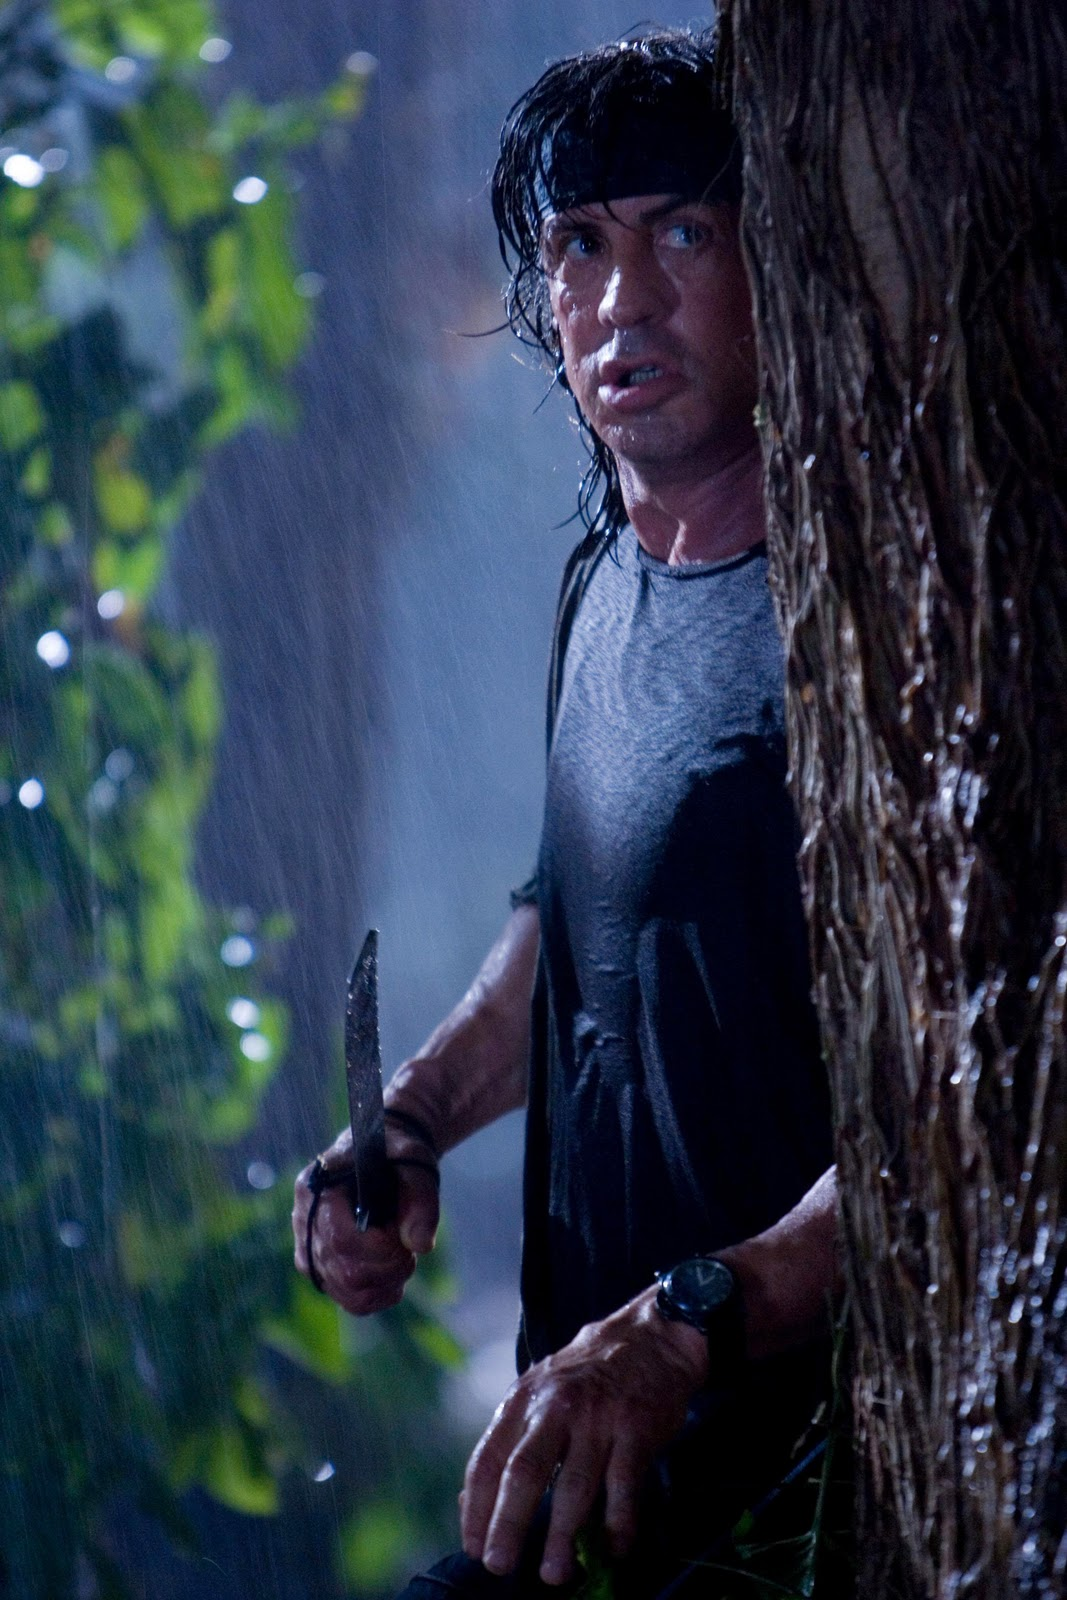 Music N' More: Rambo (...